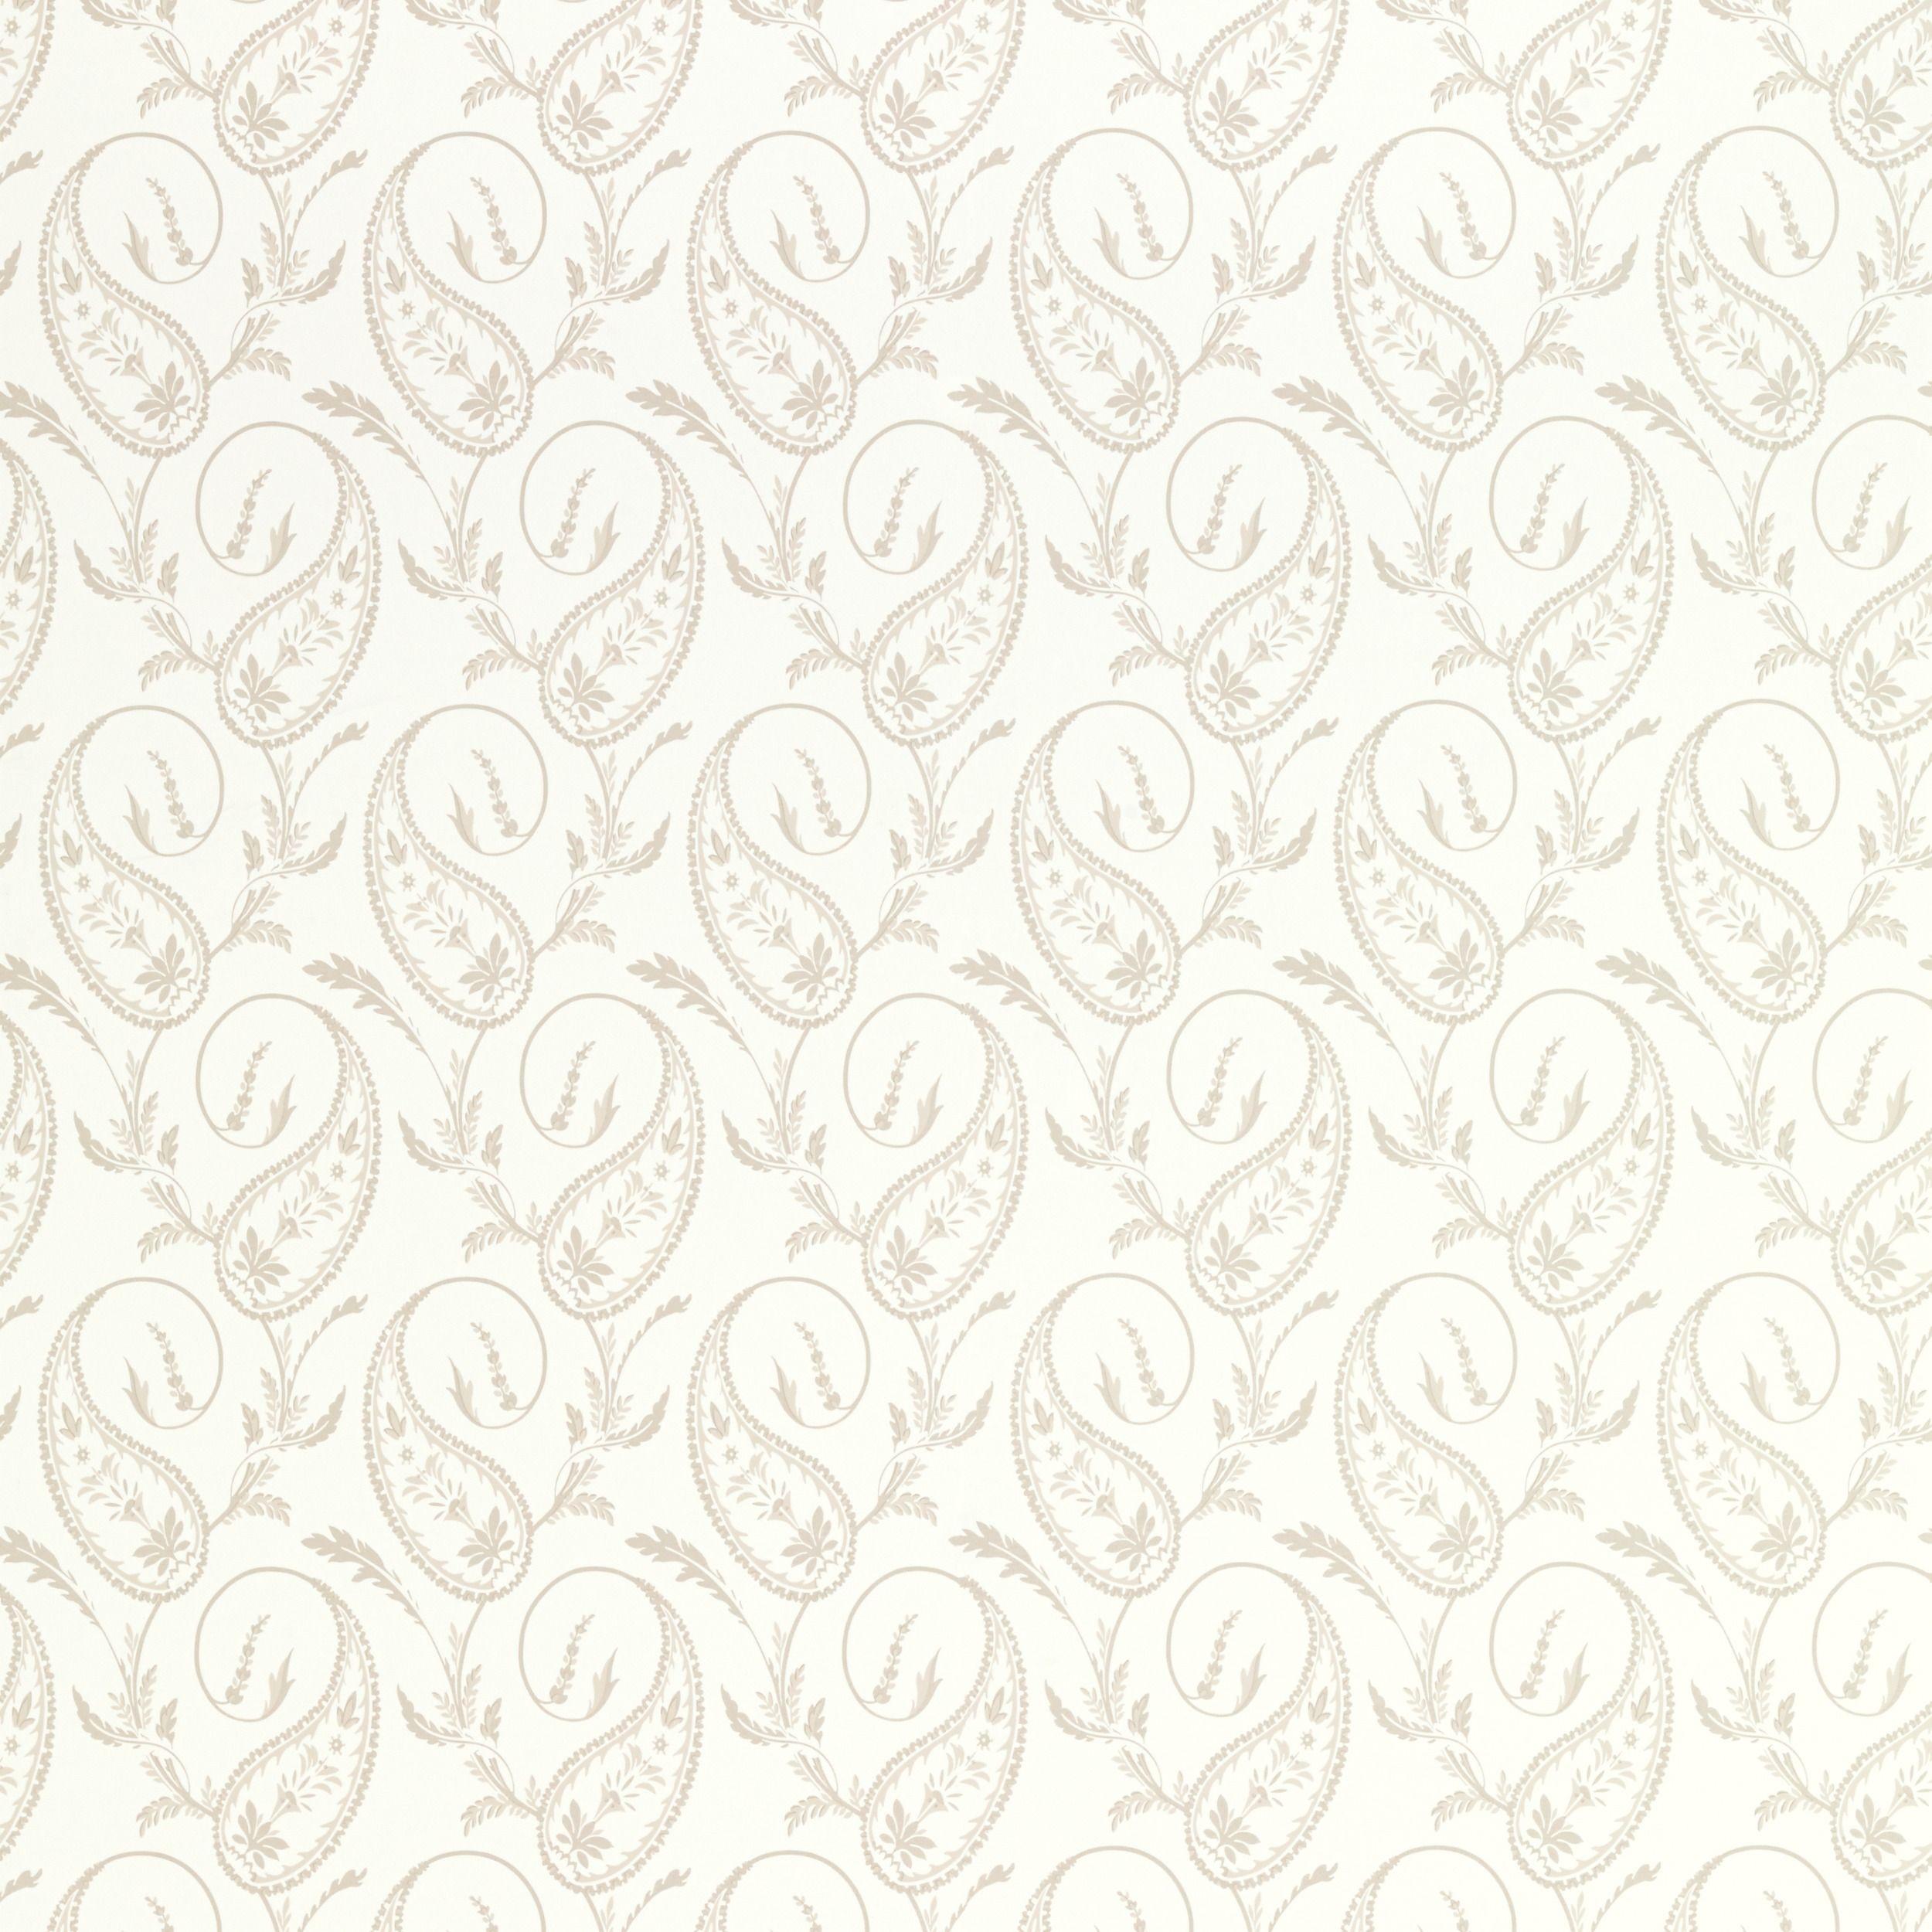 Thistlewood Natural Patterned Wallpaper